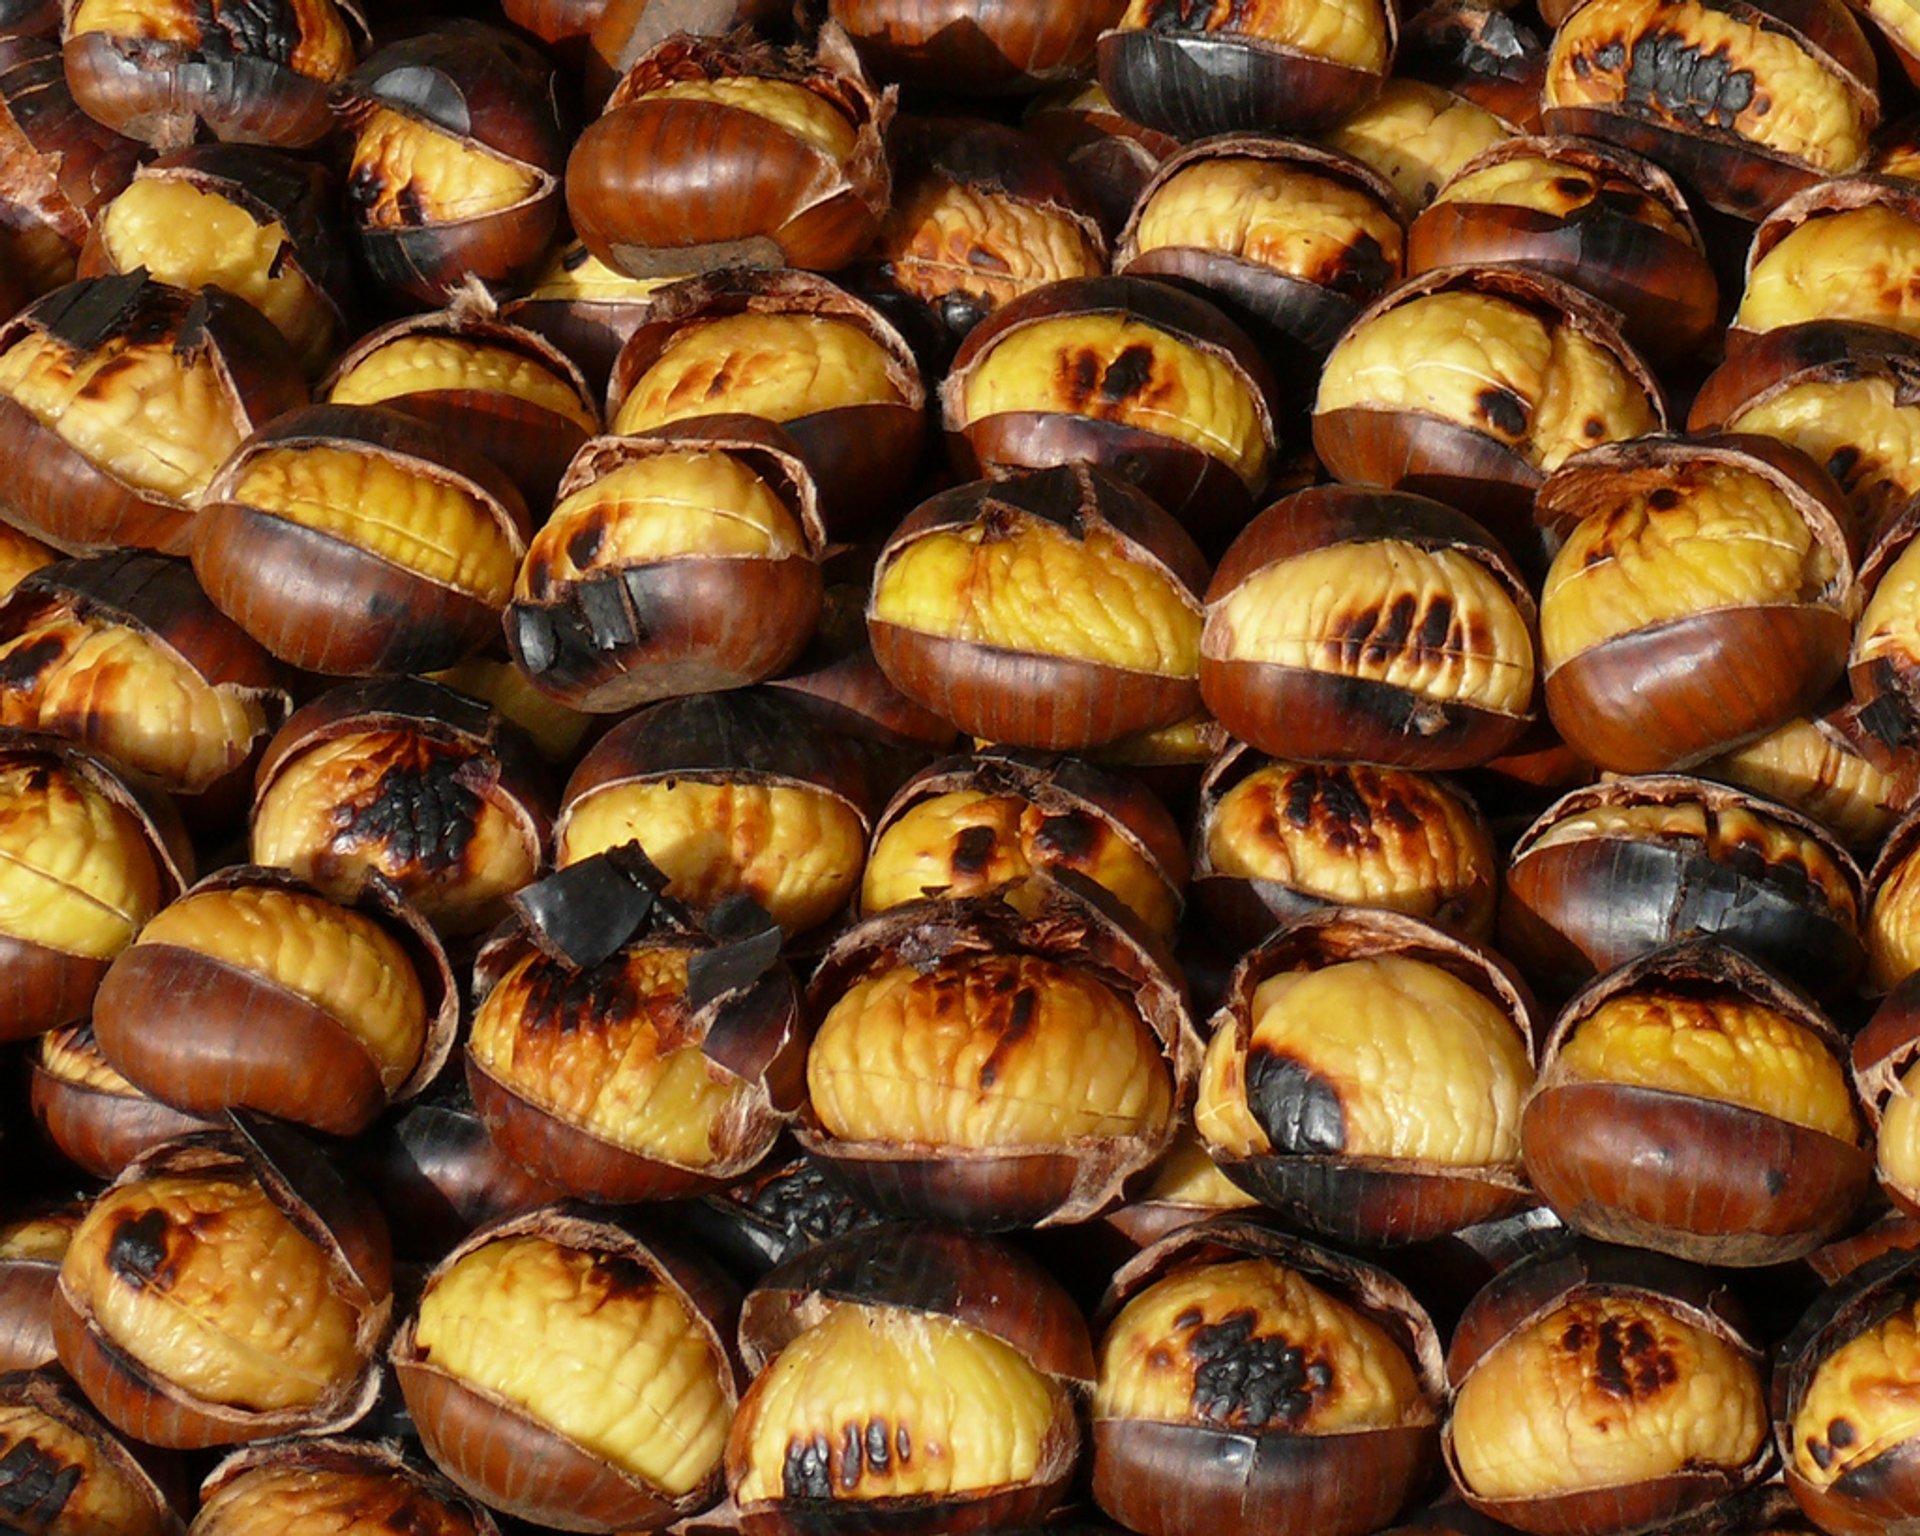 Sicilian Chestnuts in Sicily - Best Season 2020